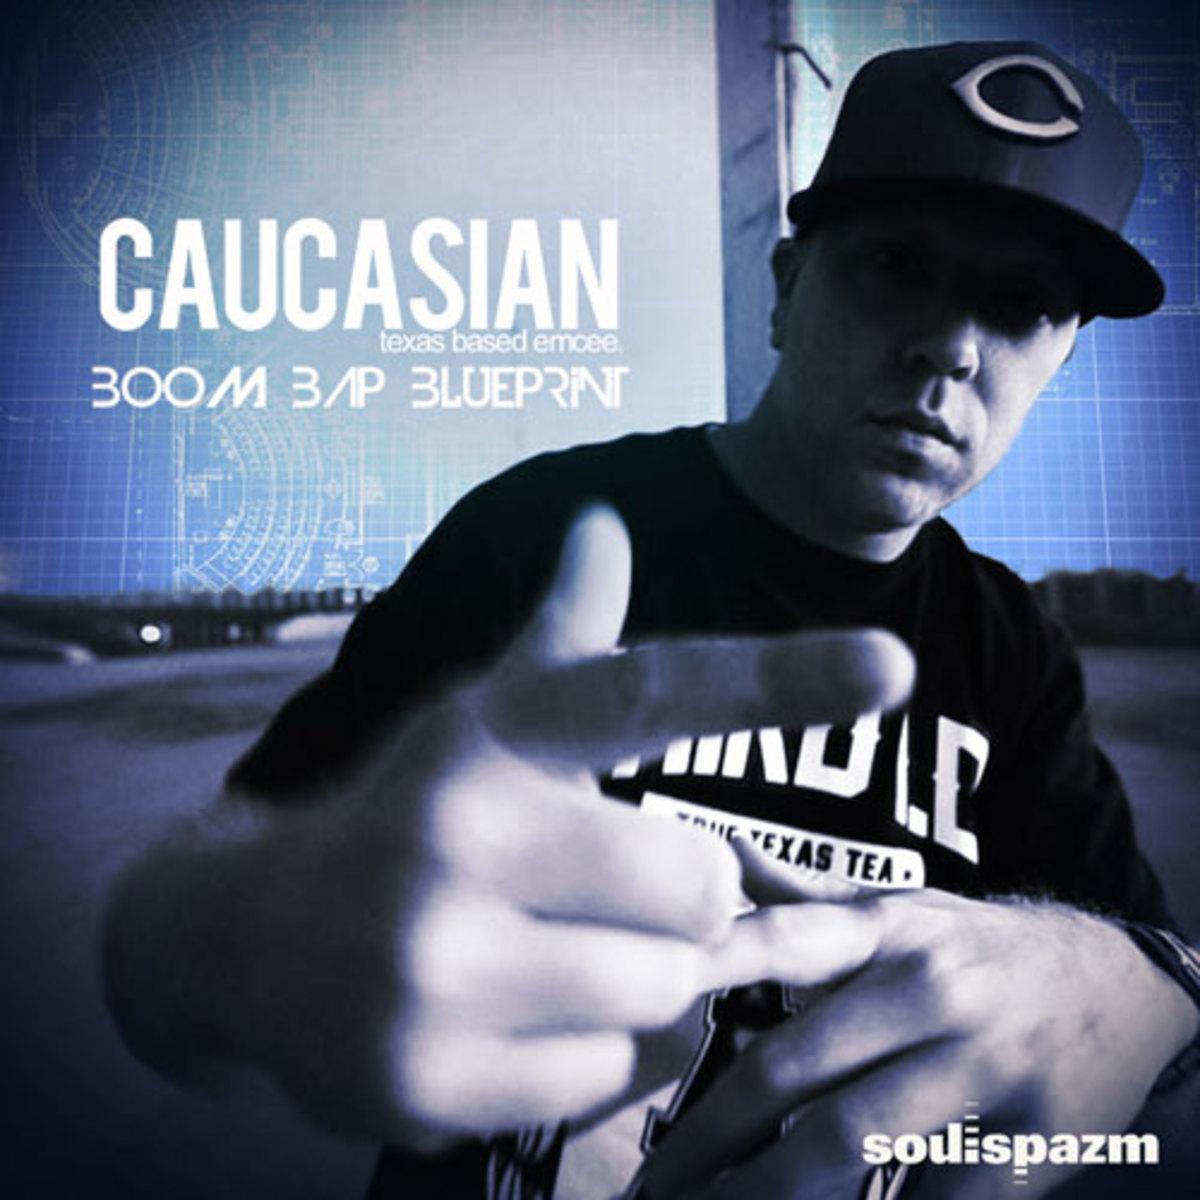 caucasion-bbblueprint.jpg